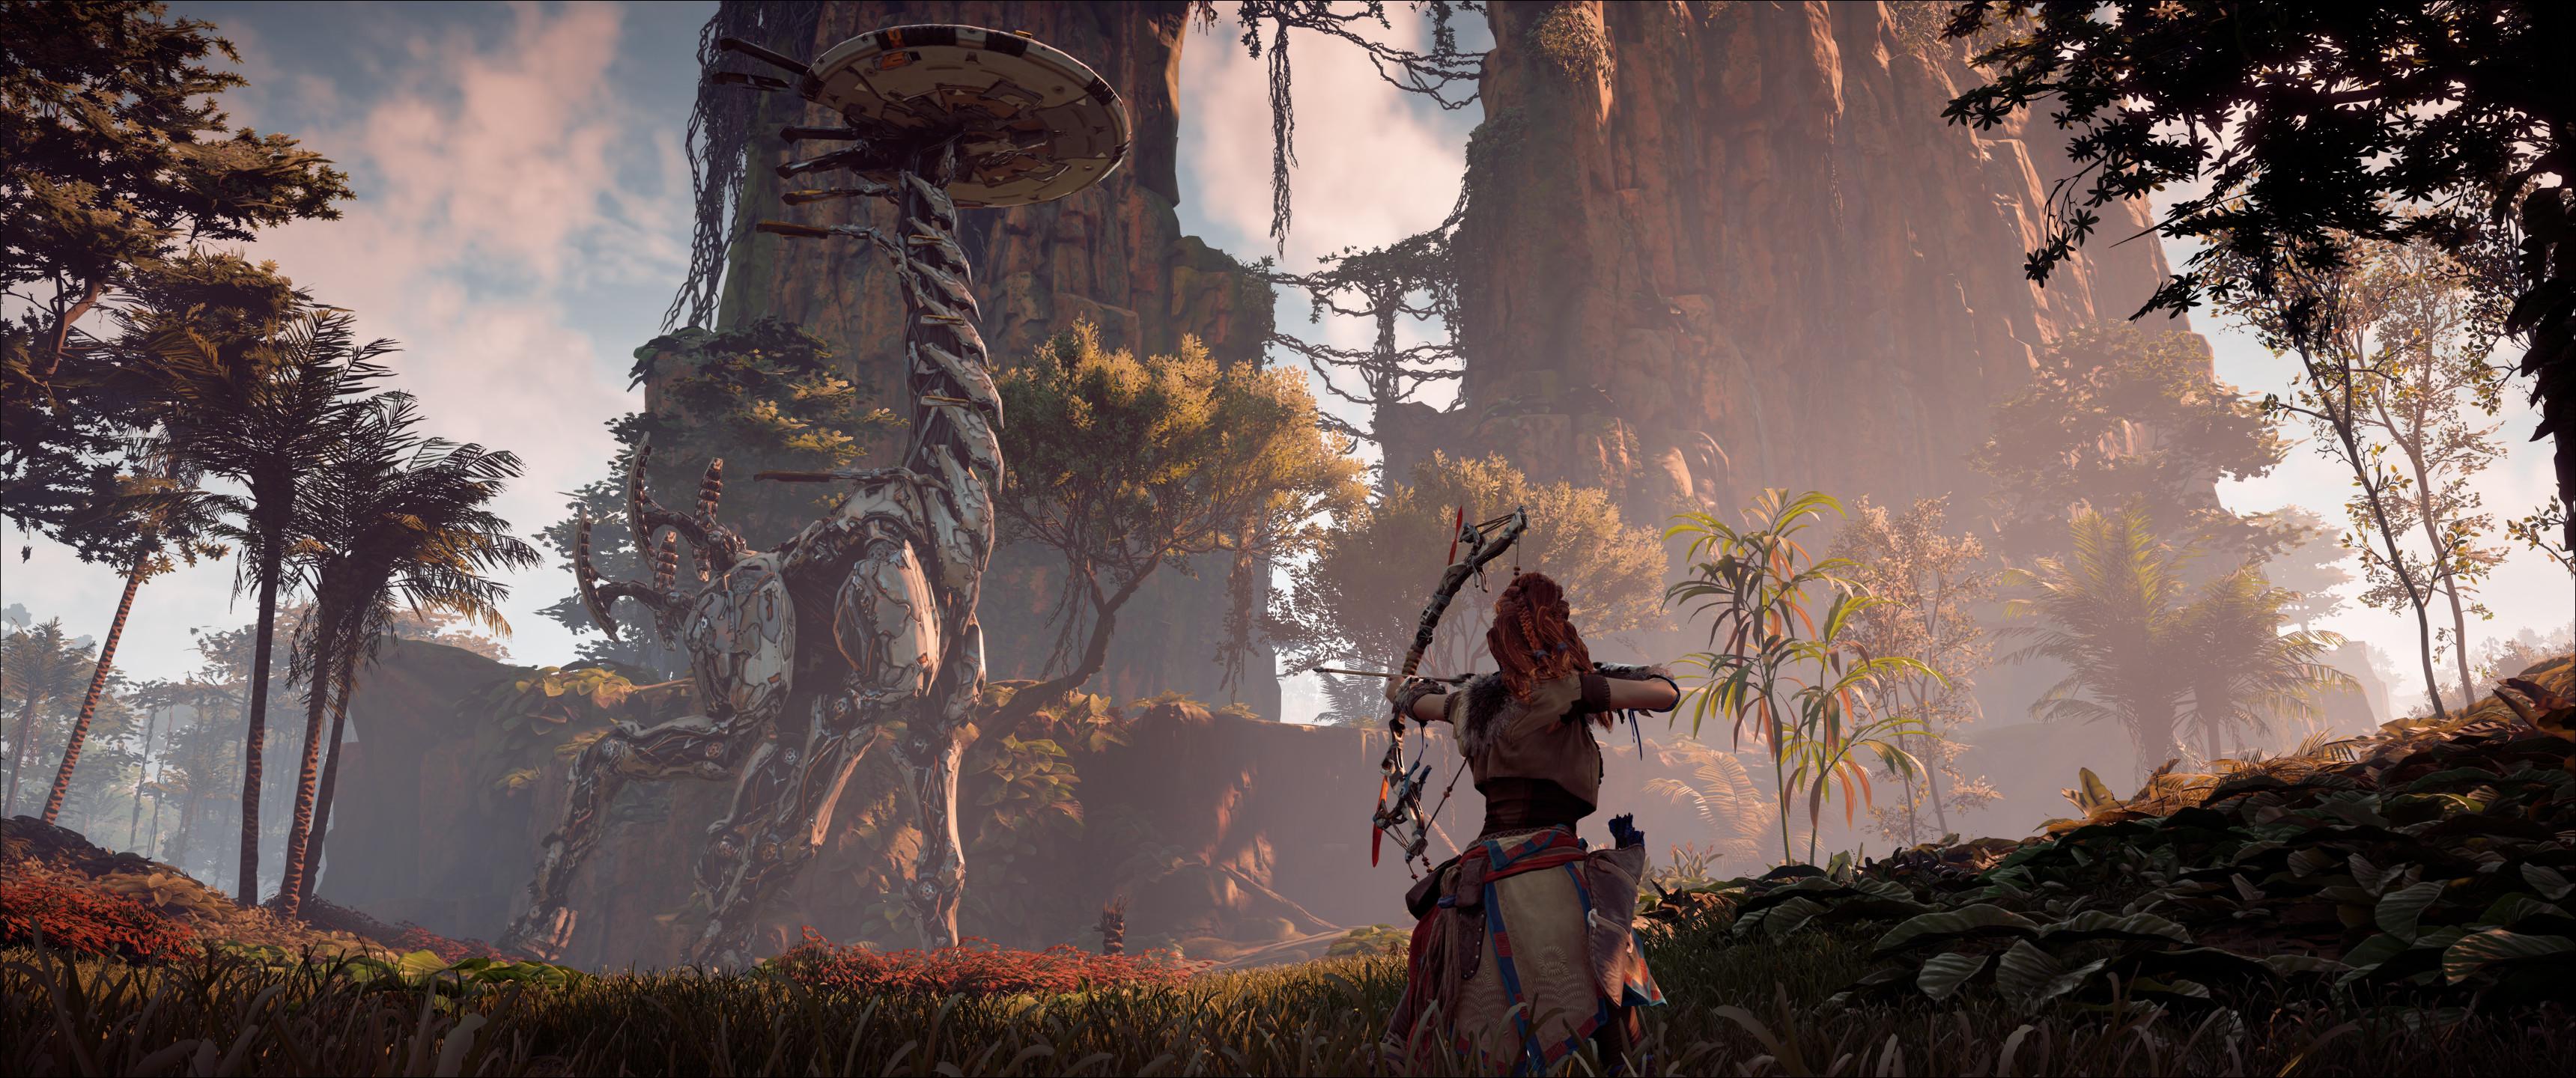 Первый скриншот PC-версии Horizon: Zero Dawn